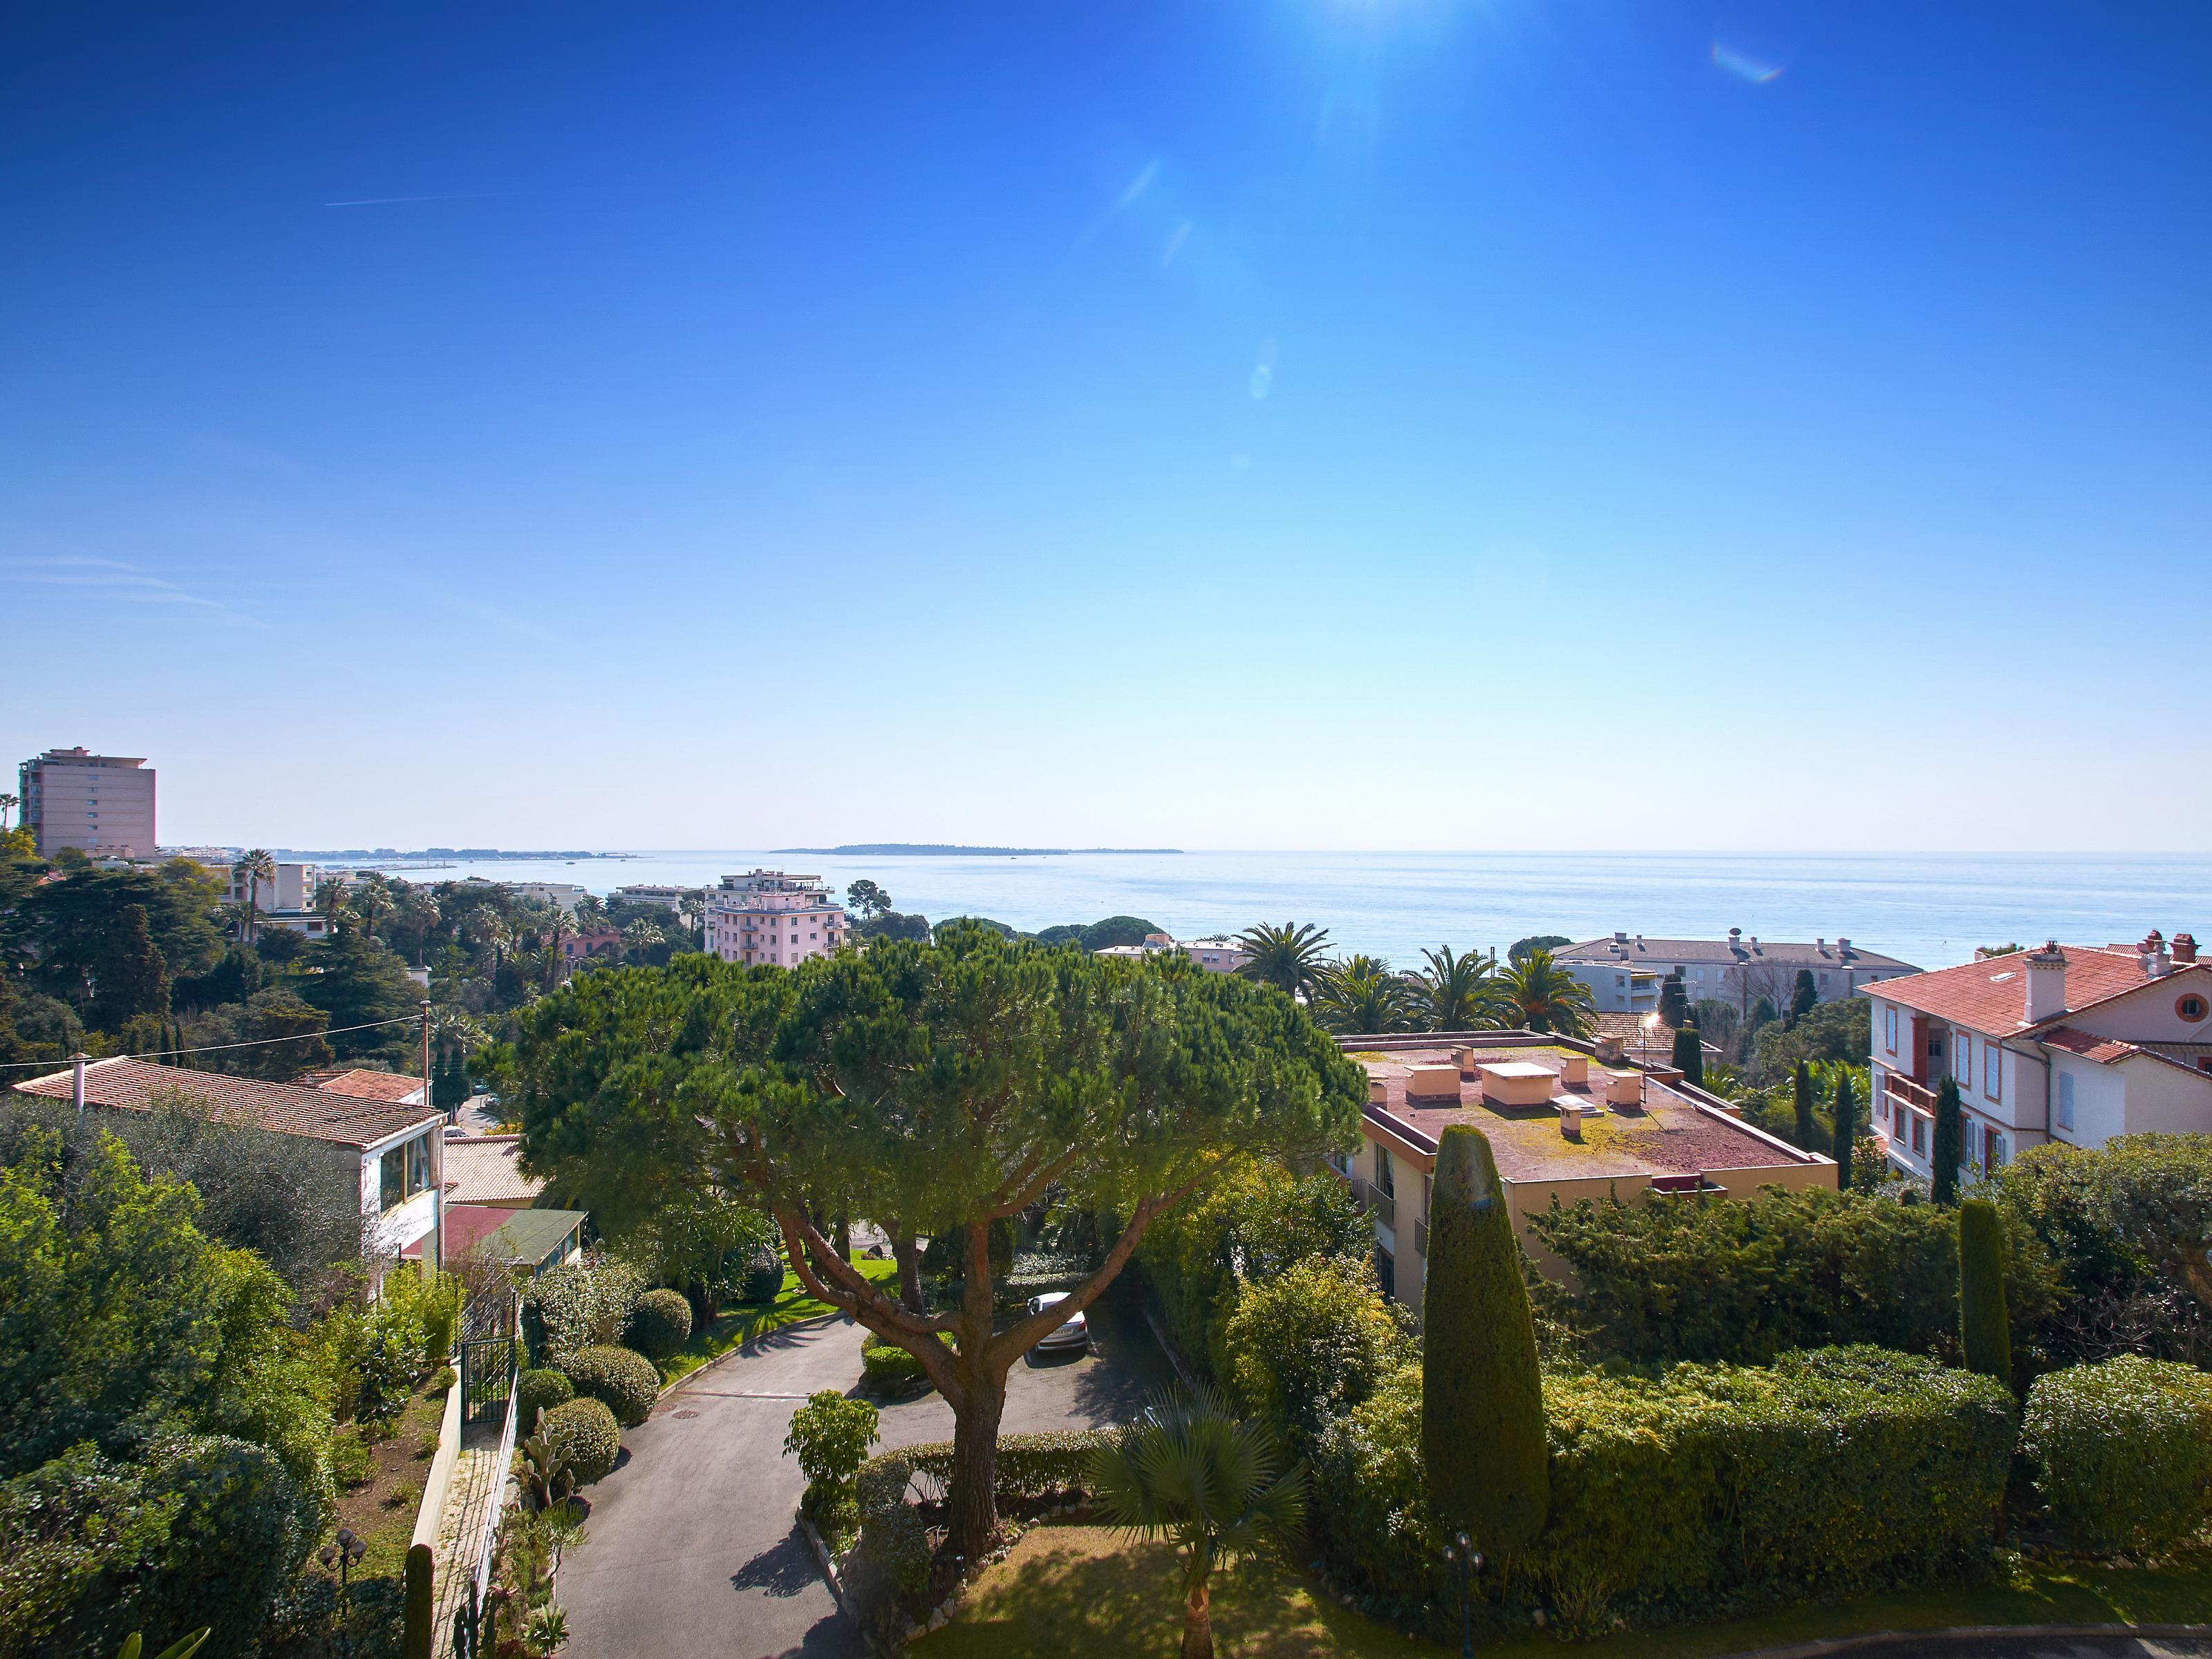 Casa Unifamiliar por un Venta en Apartment for sale Cannes Cannes, Provincia - Alpes - Costa Azul 06150 Francia